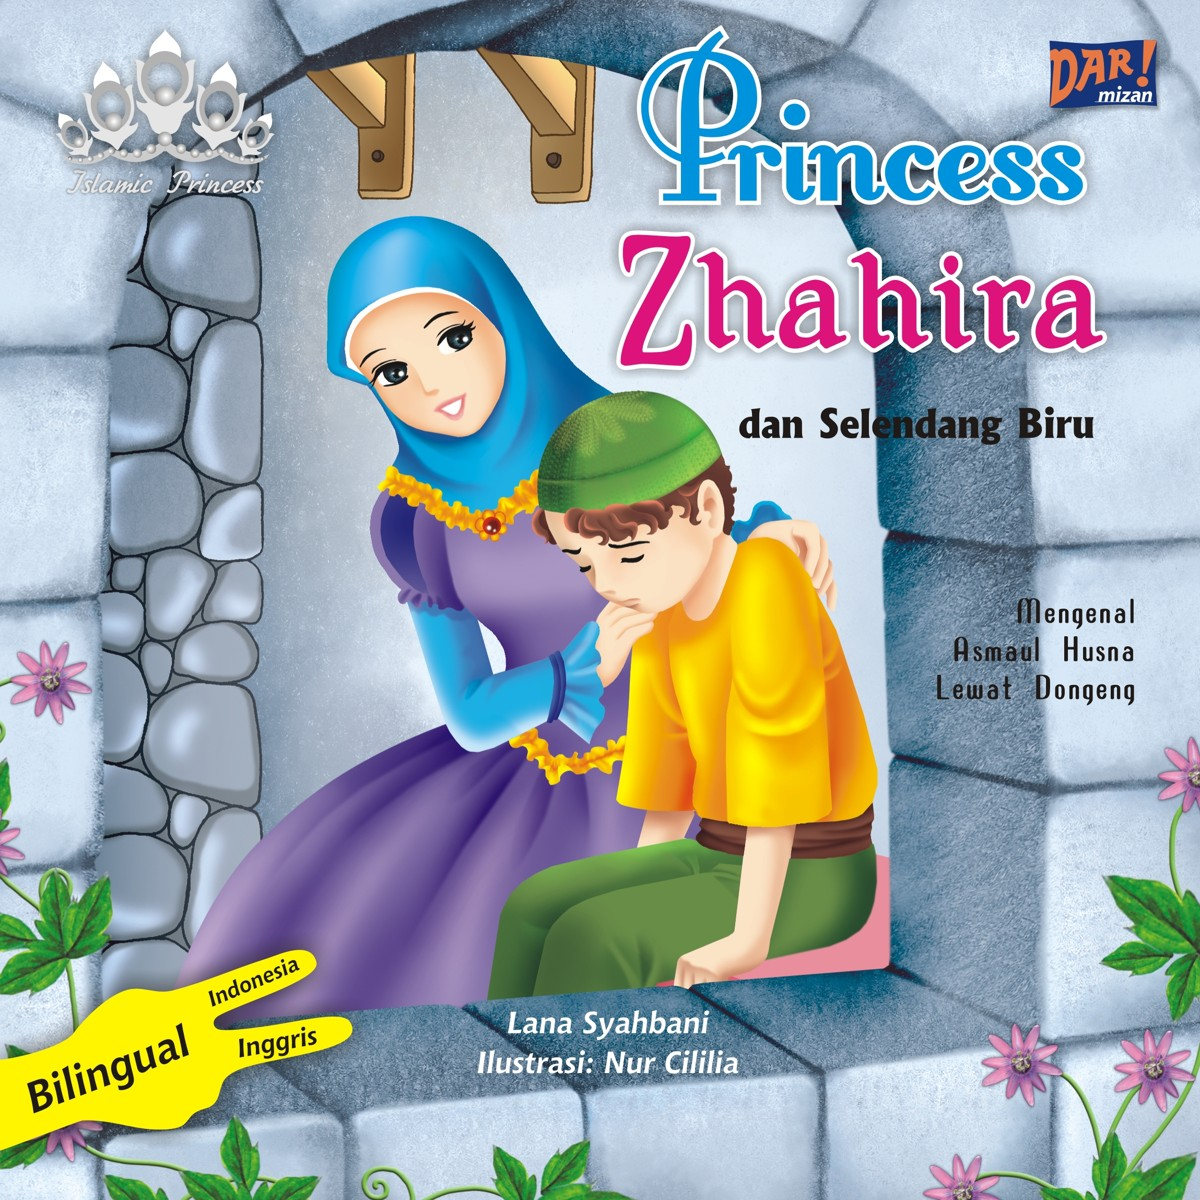 Princess Zhahira dan Selendang Biru [sumber elektronis]